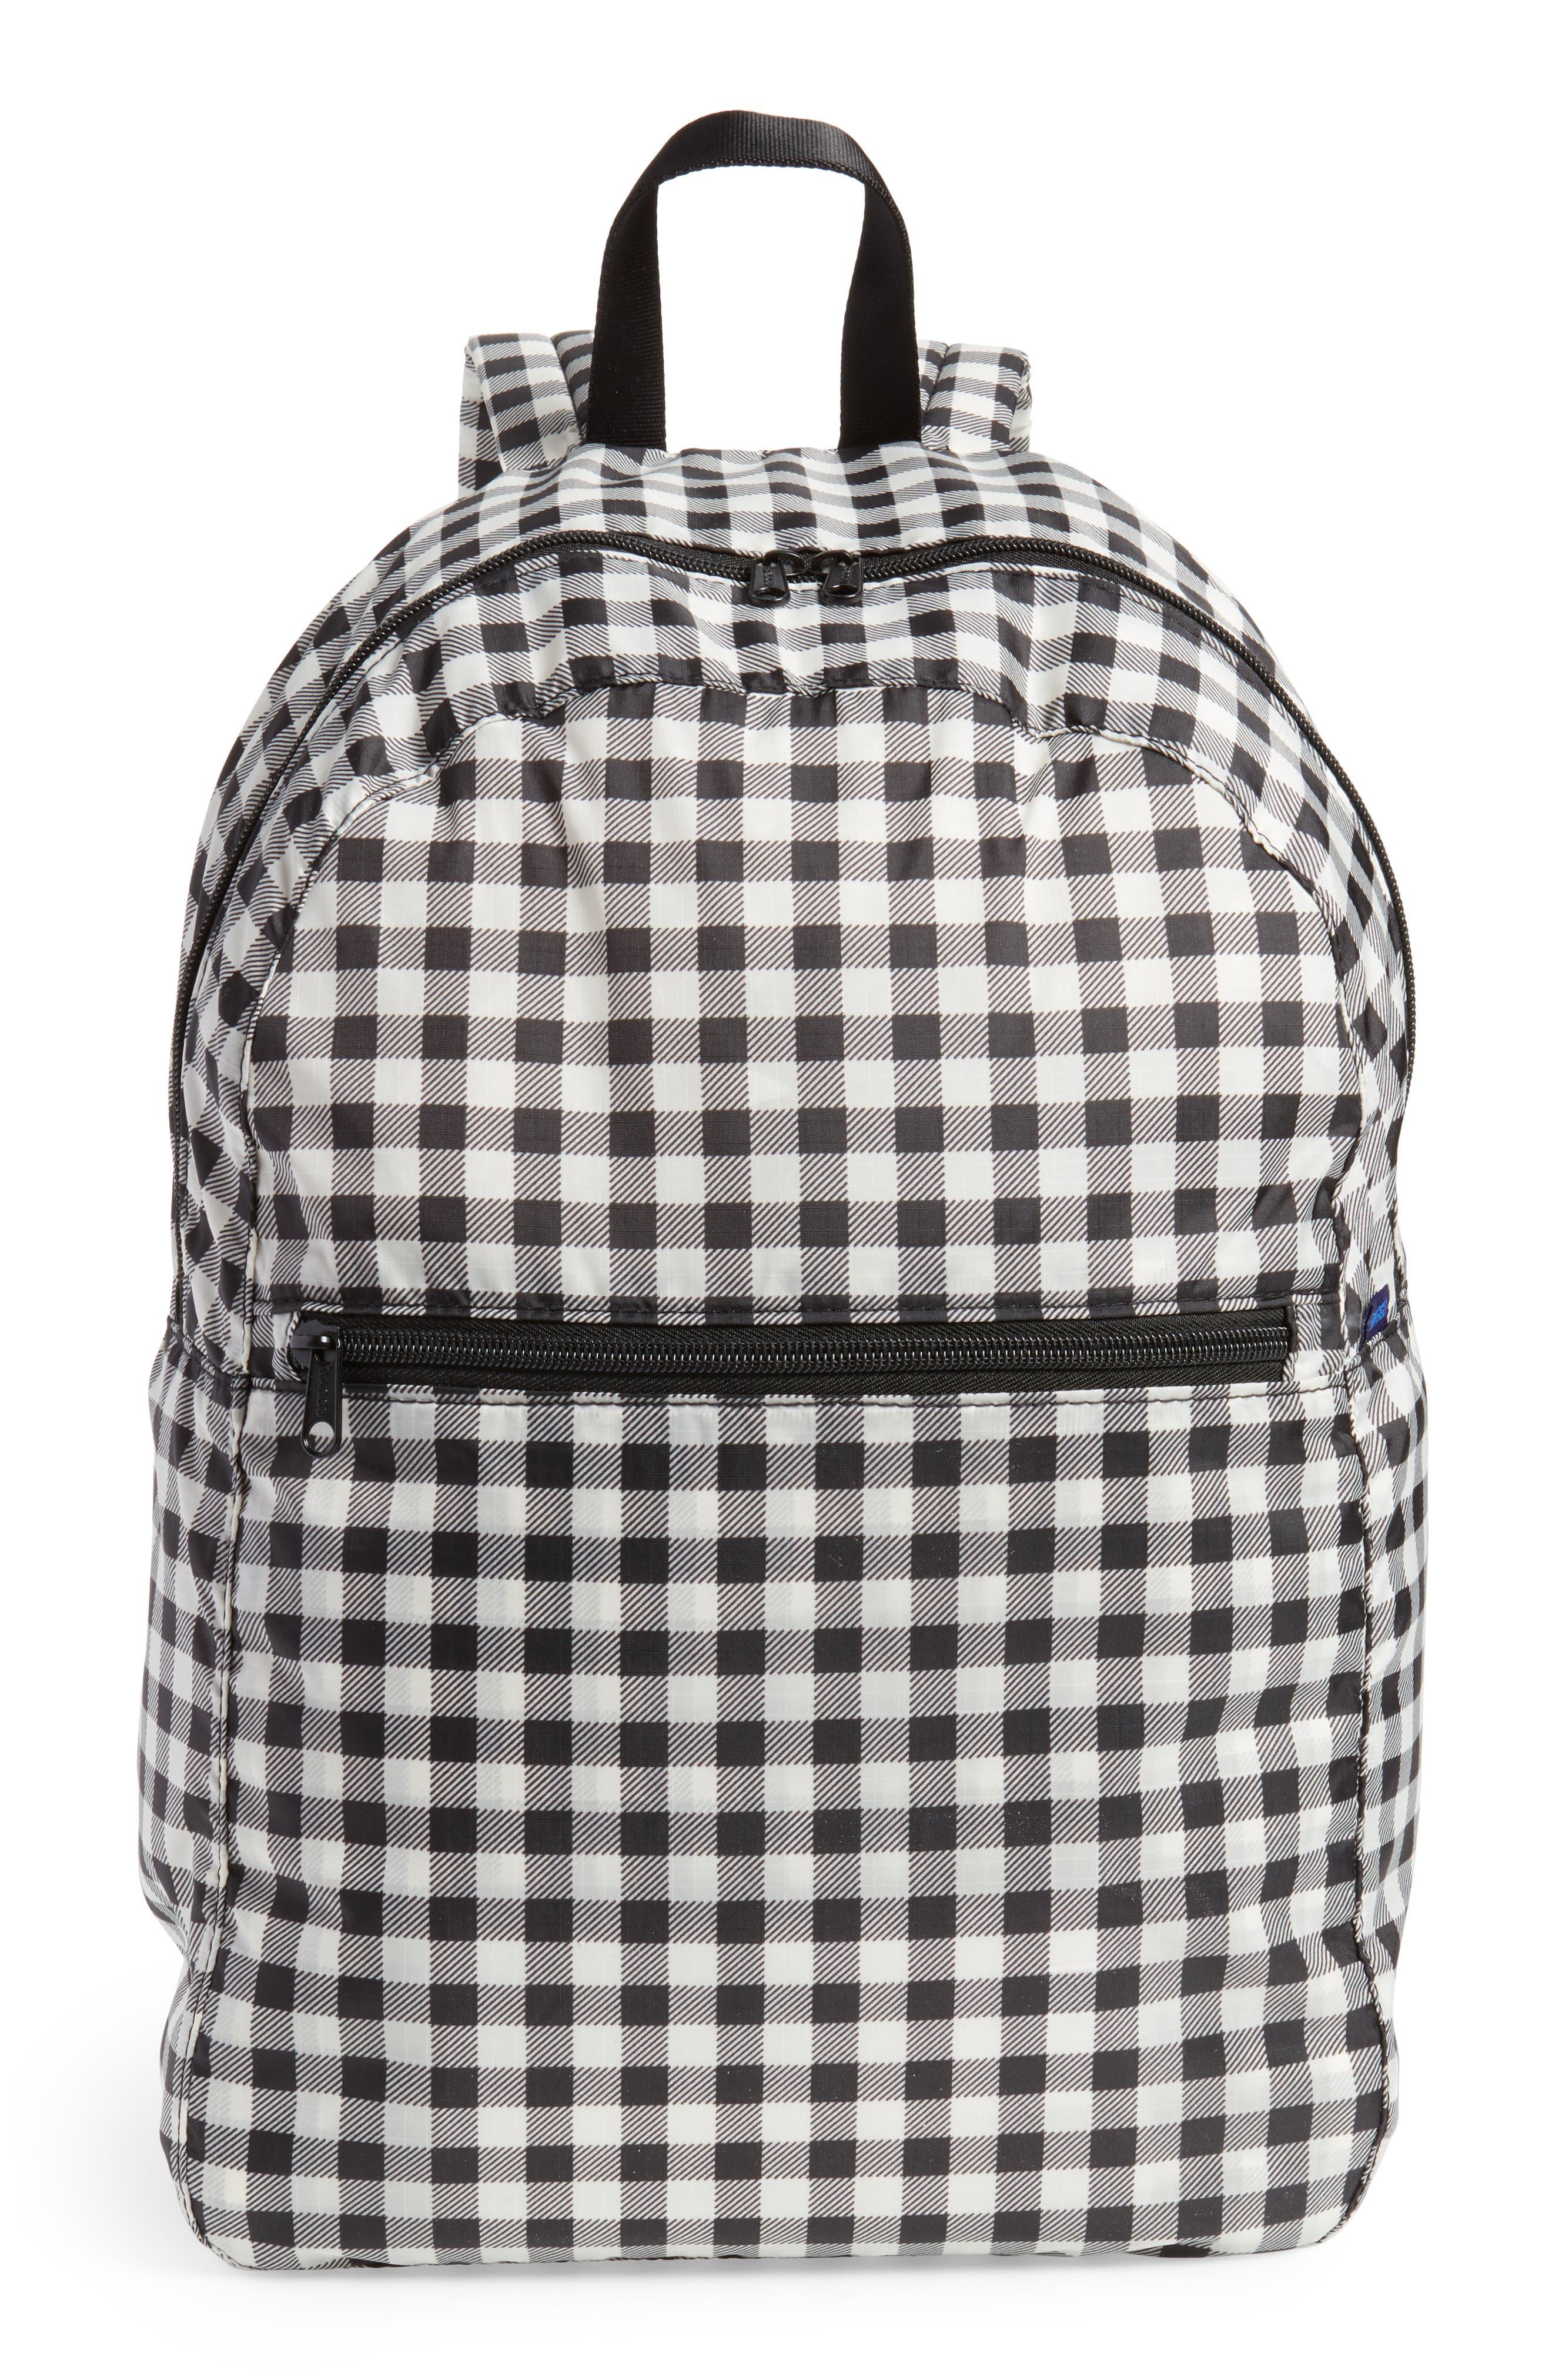 Ripstop Nylon Backpack,                         Main,                         color, Black Gingham